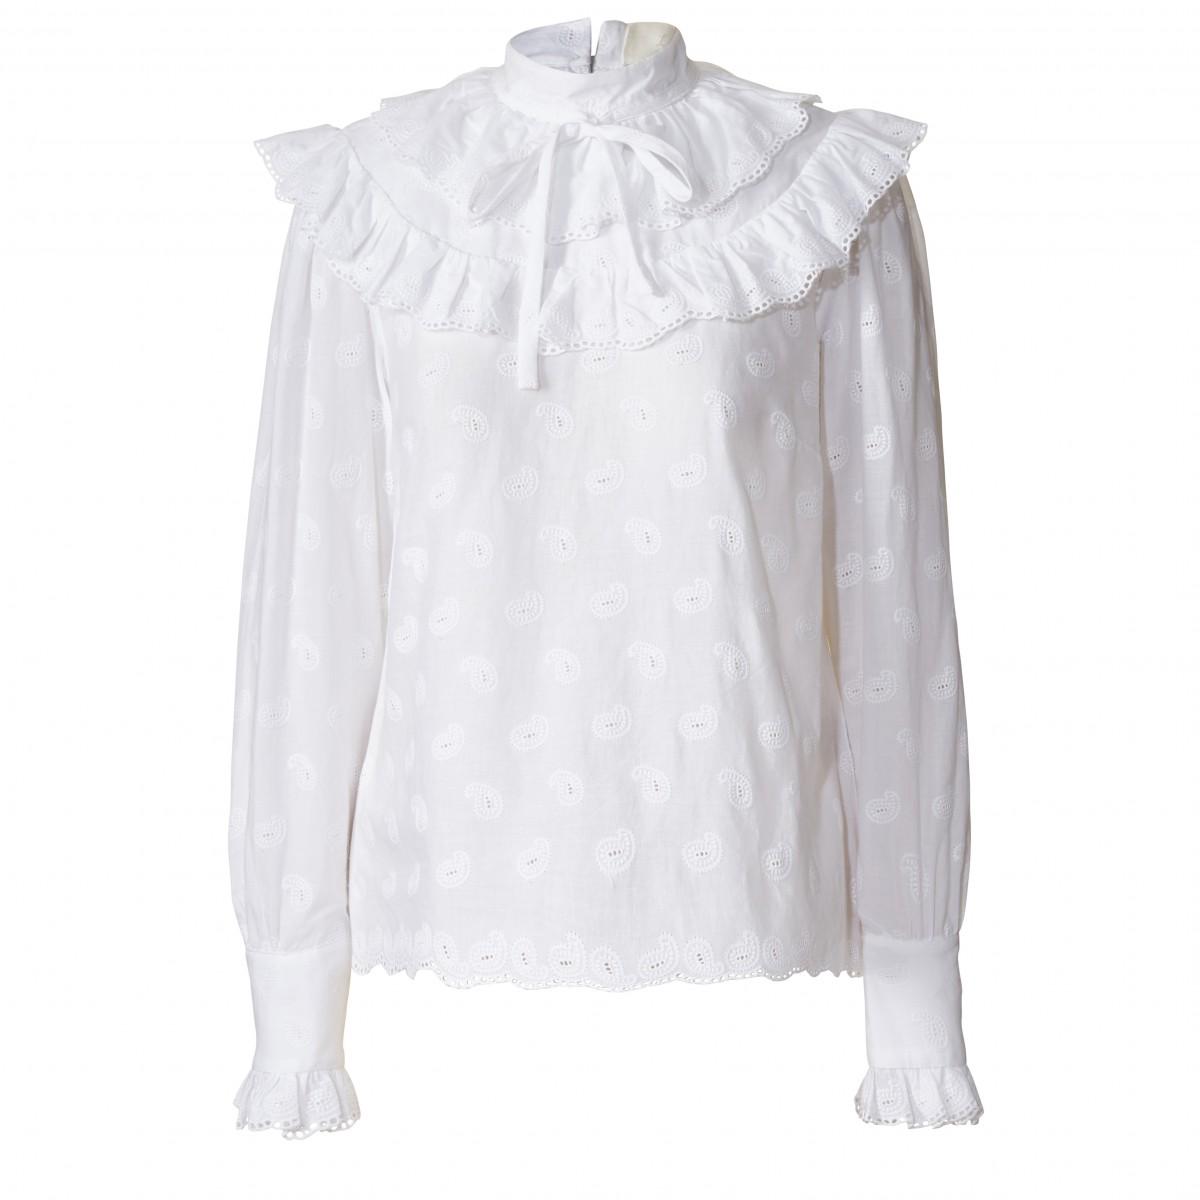 Pippa Honeymoon blouse by Orla Kiely